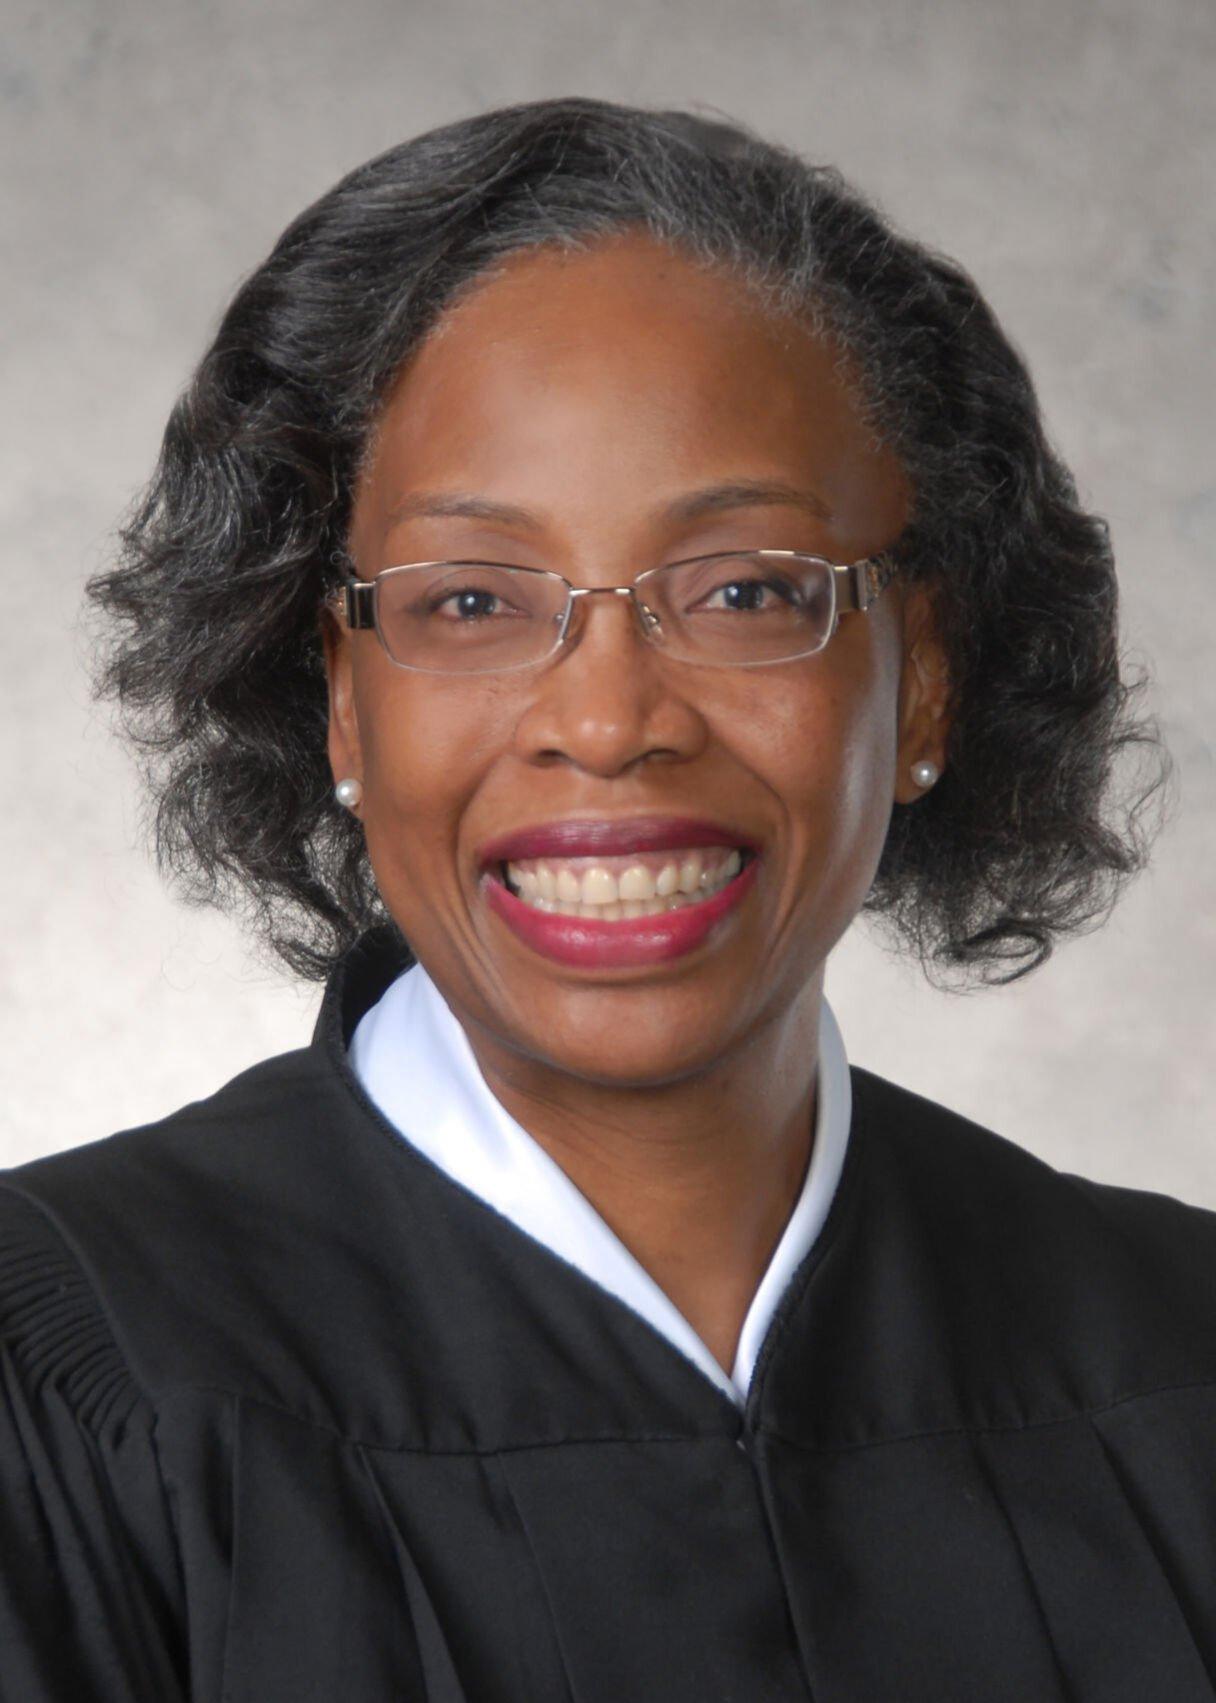 201007-yh-news-court6-1.jpg